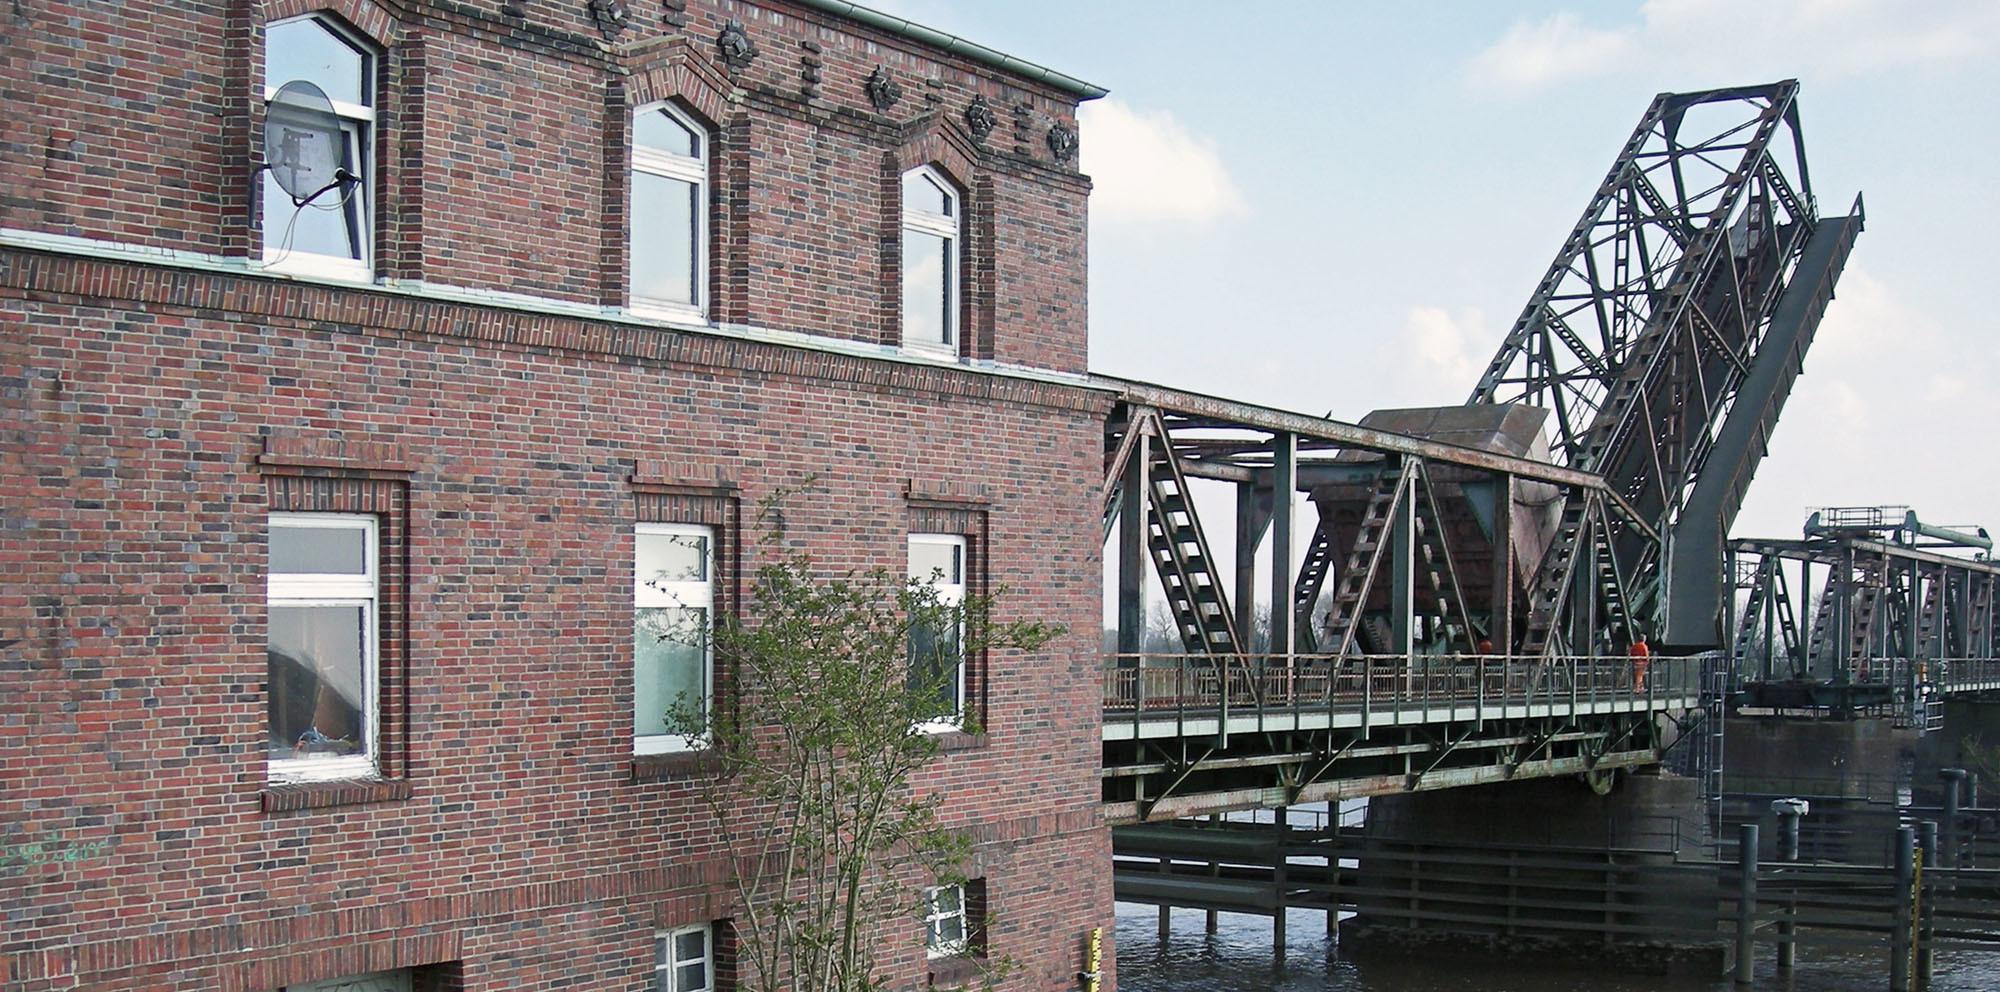 Friesenbrücke, Weener